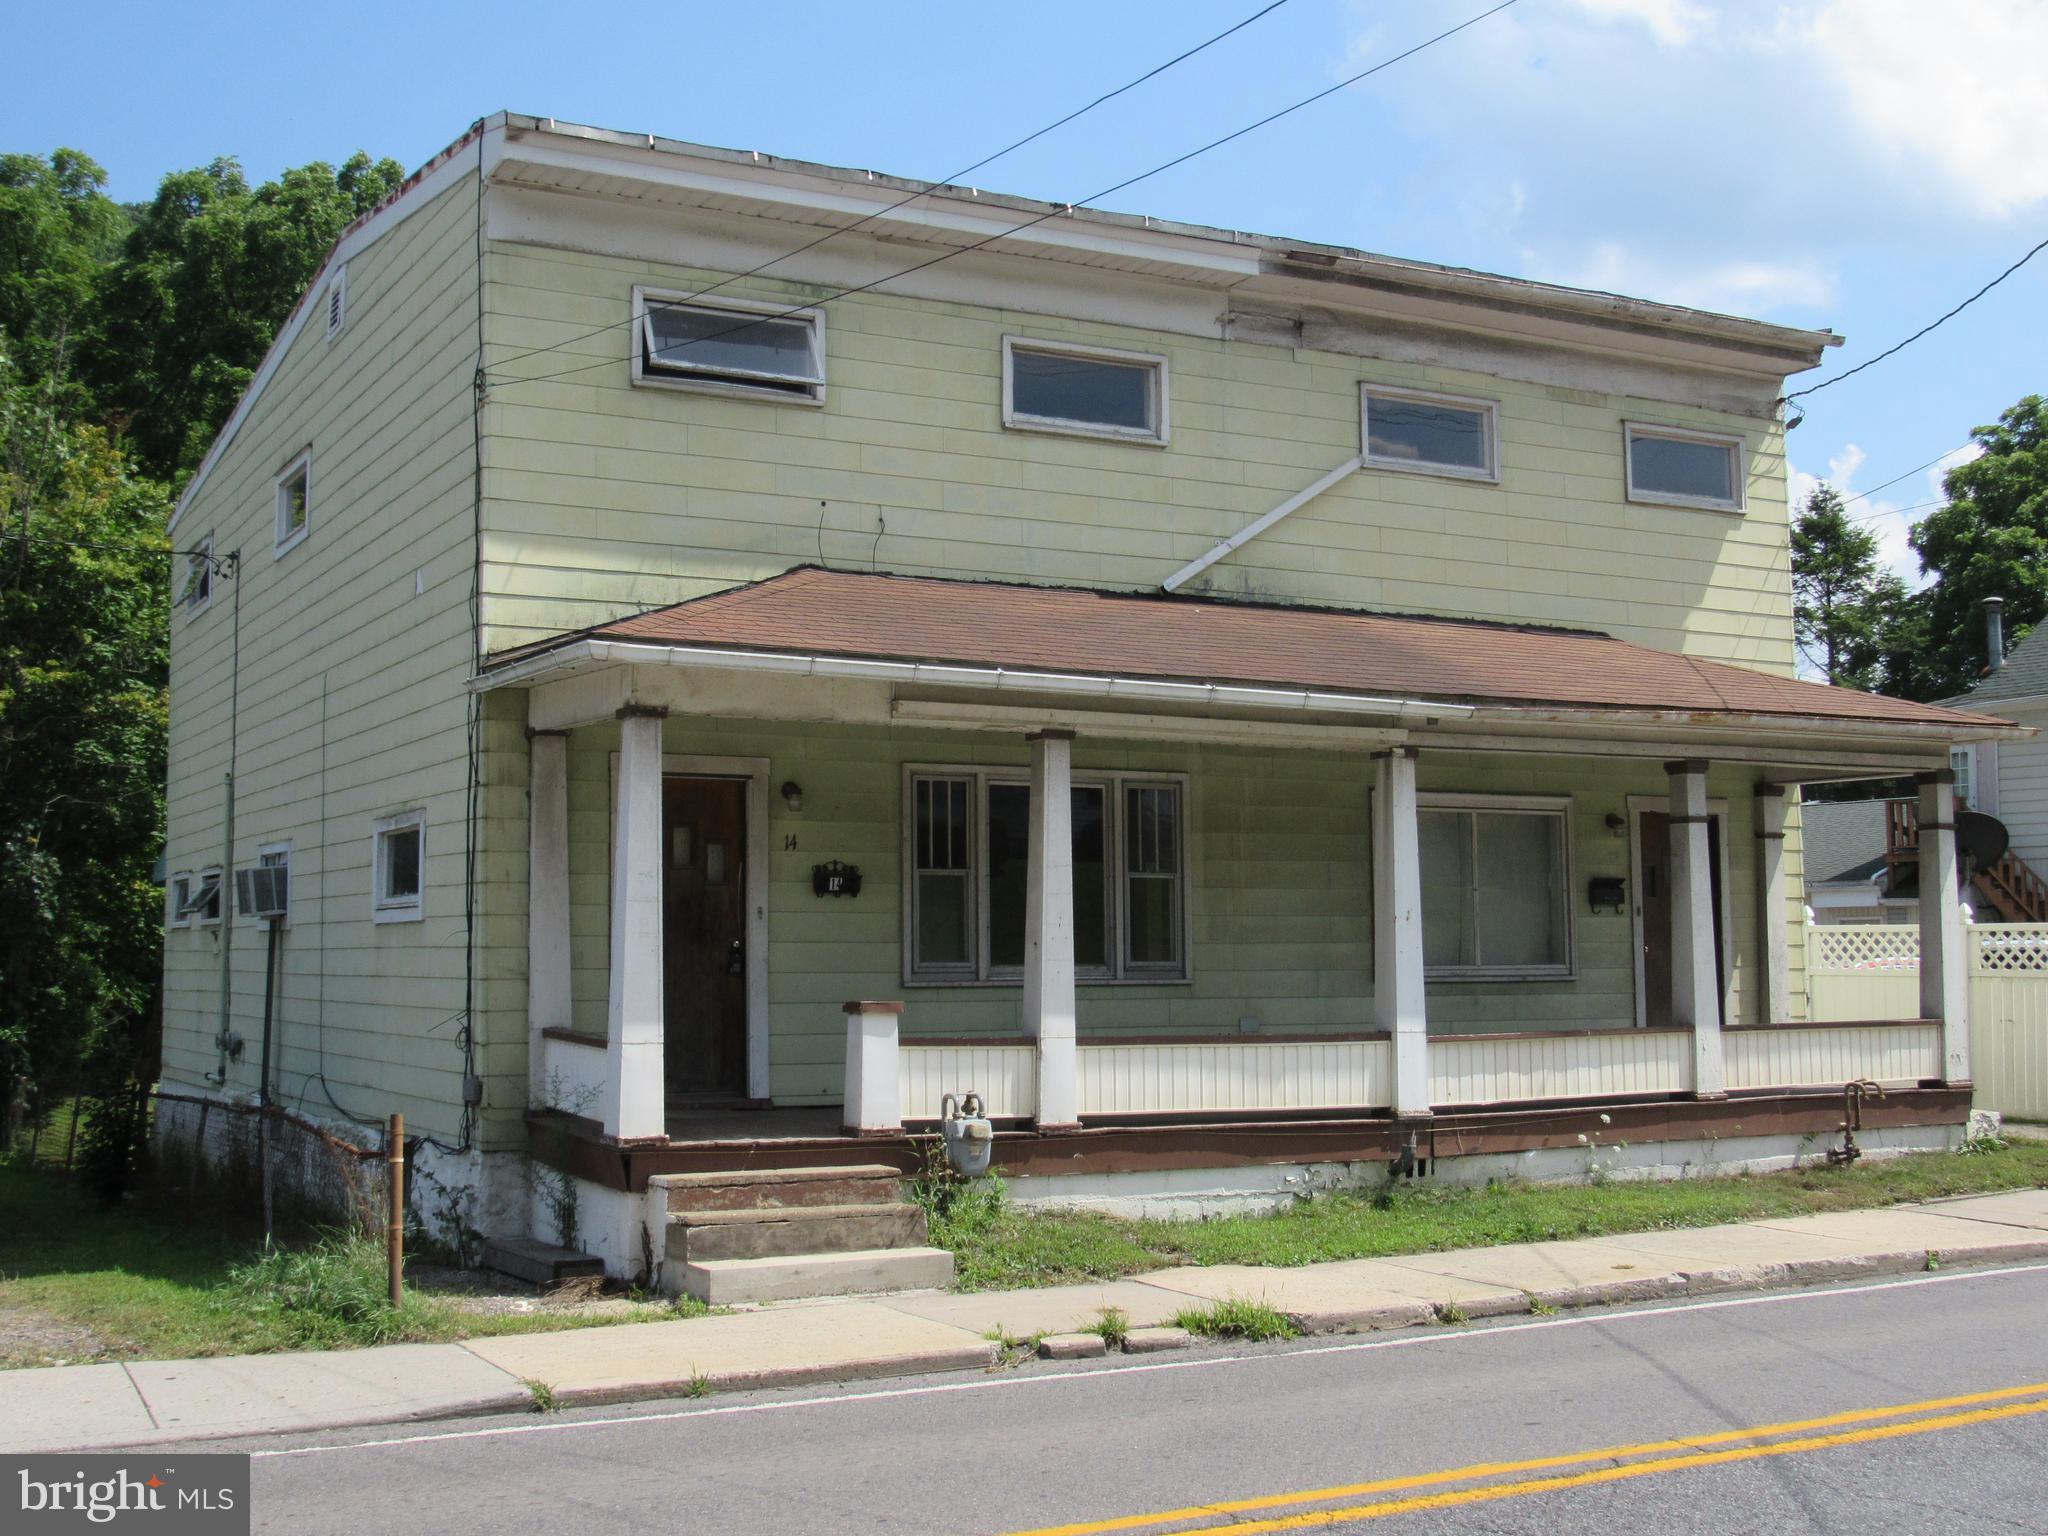 12-14 E MAIN STREET, LONACONING, MD 21539